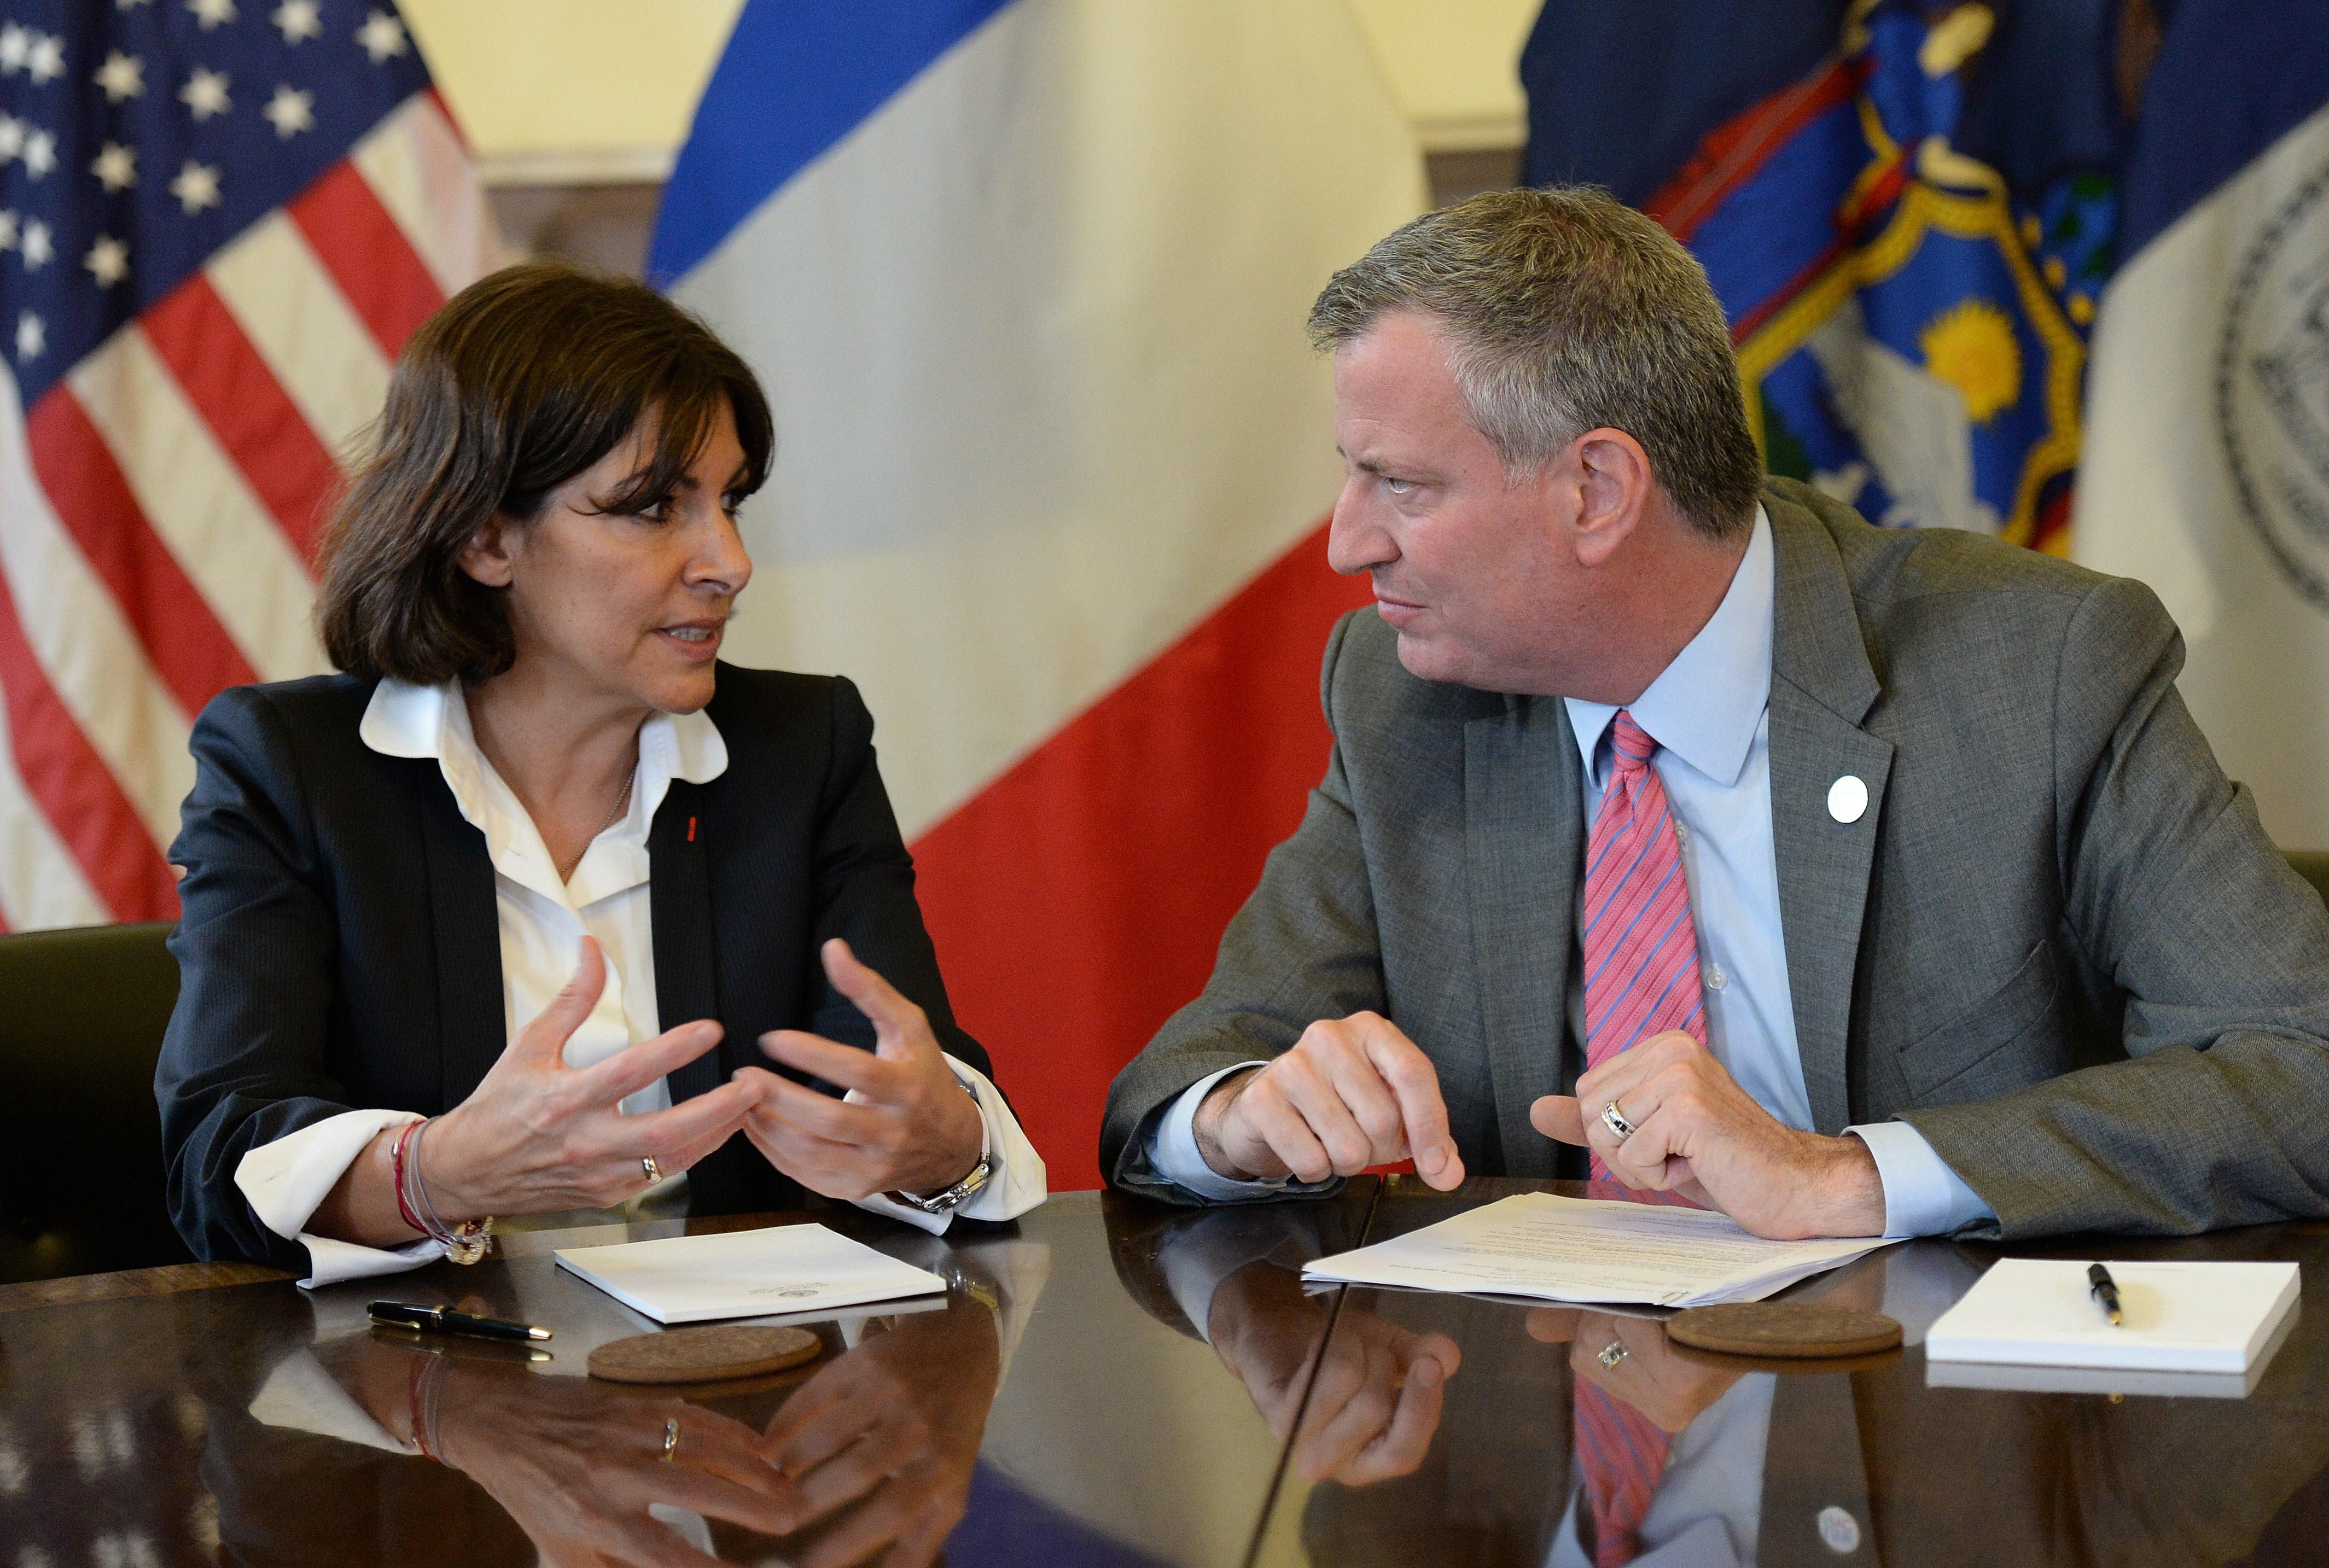 Mayor Bill de Blasio bonds with Paris Mayor Anne Hidalgo. (Photo: EMMANUEL DUNAND/AFP/Getty)